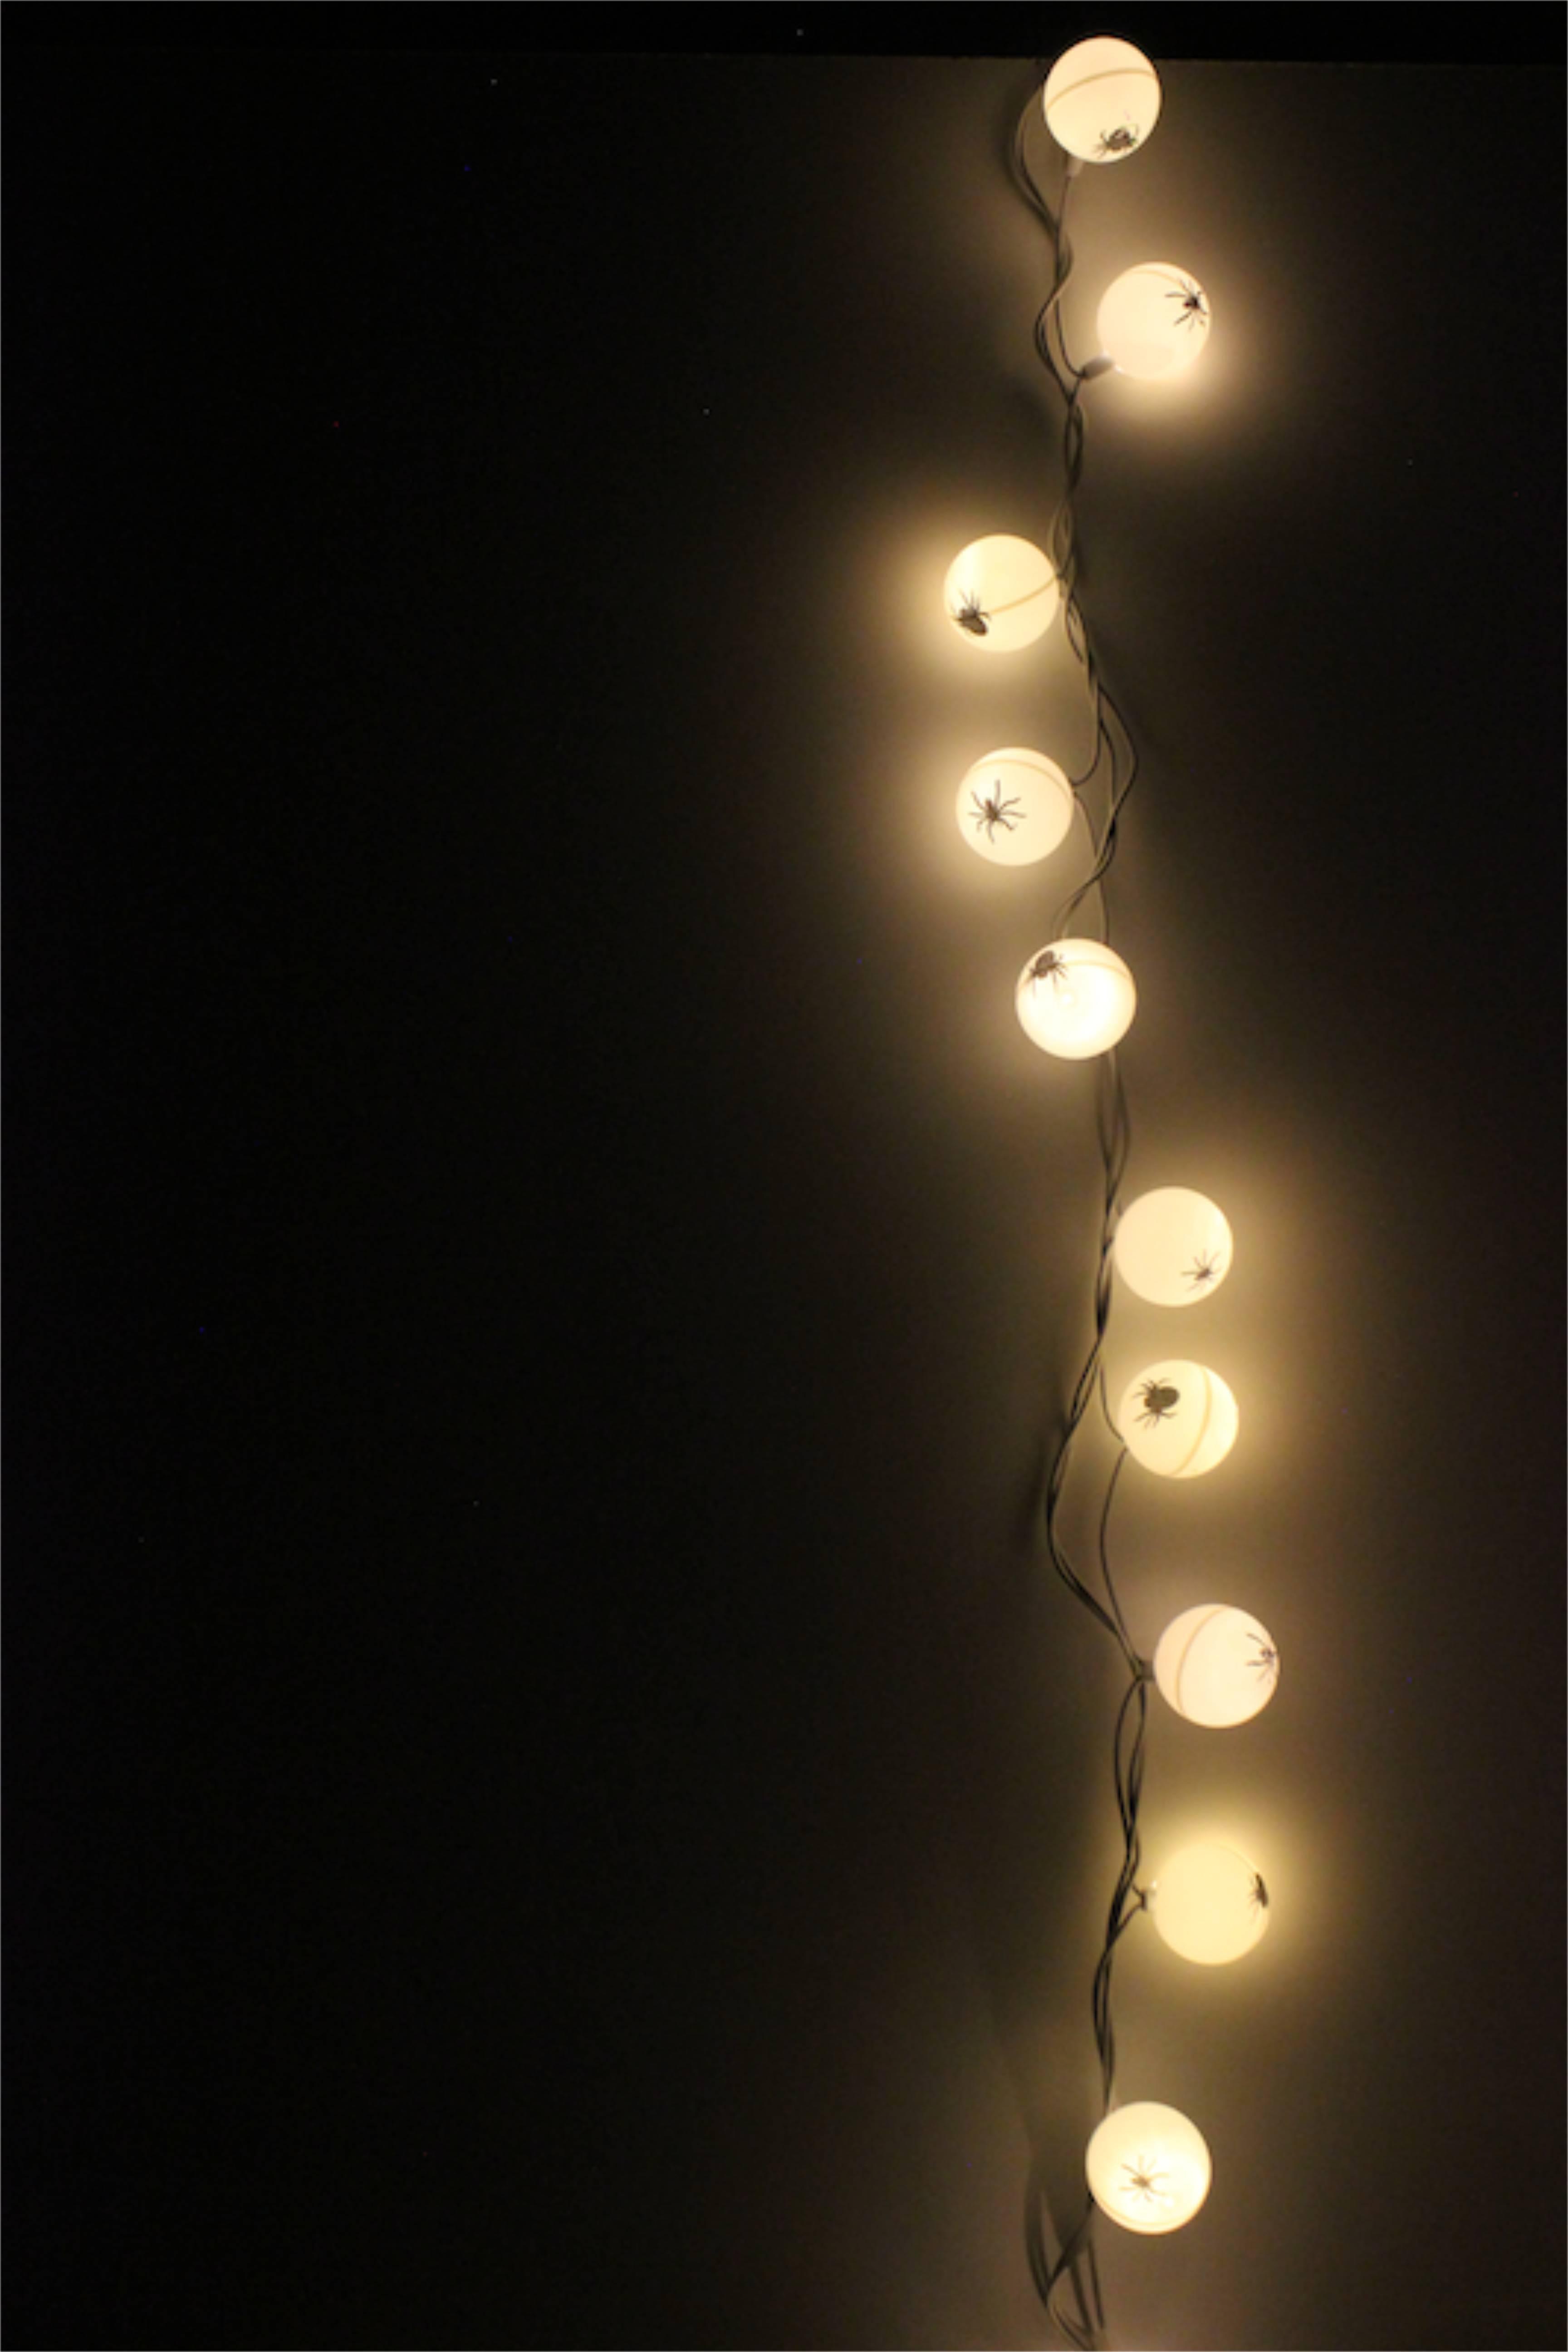 diy halloween lighting. Diy Halloween Lighting. Diy-ping-pong-ball-diy-halloween- Lighting